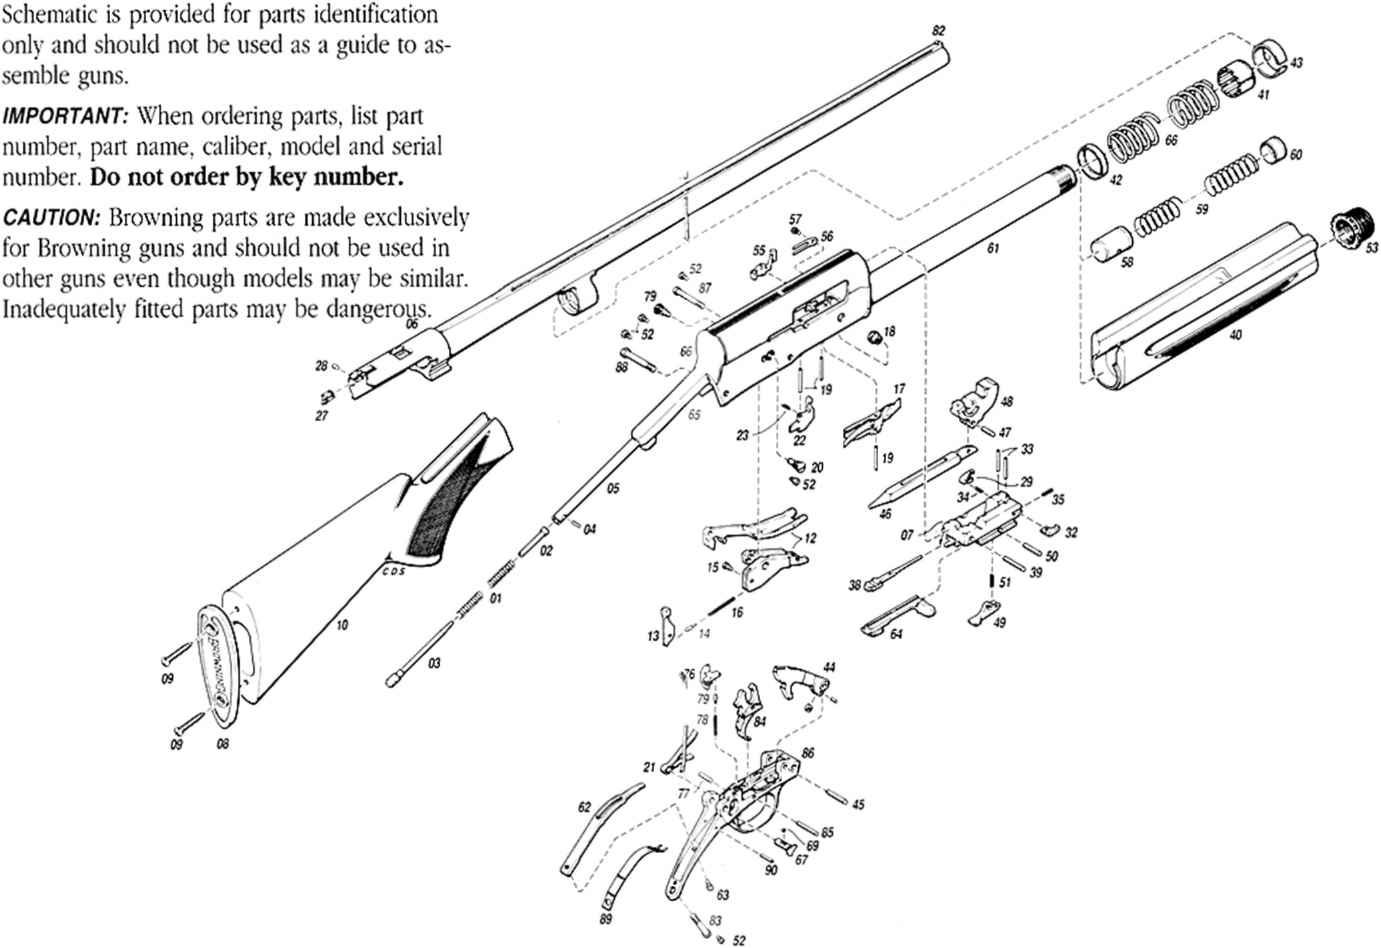 Remington 1100 Rings Diagram Electrical Wiring Parts Of A Browning A5 Shotgun Bar Safari List